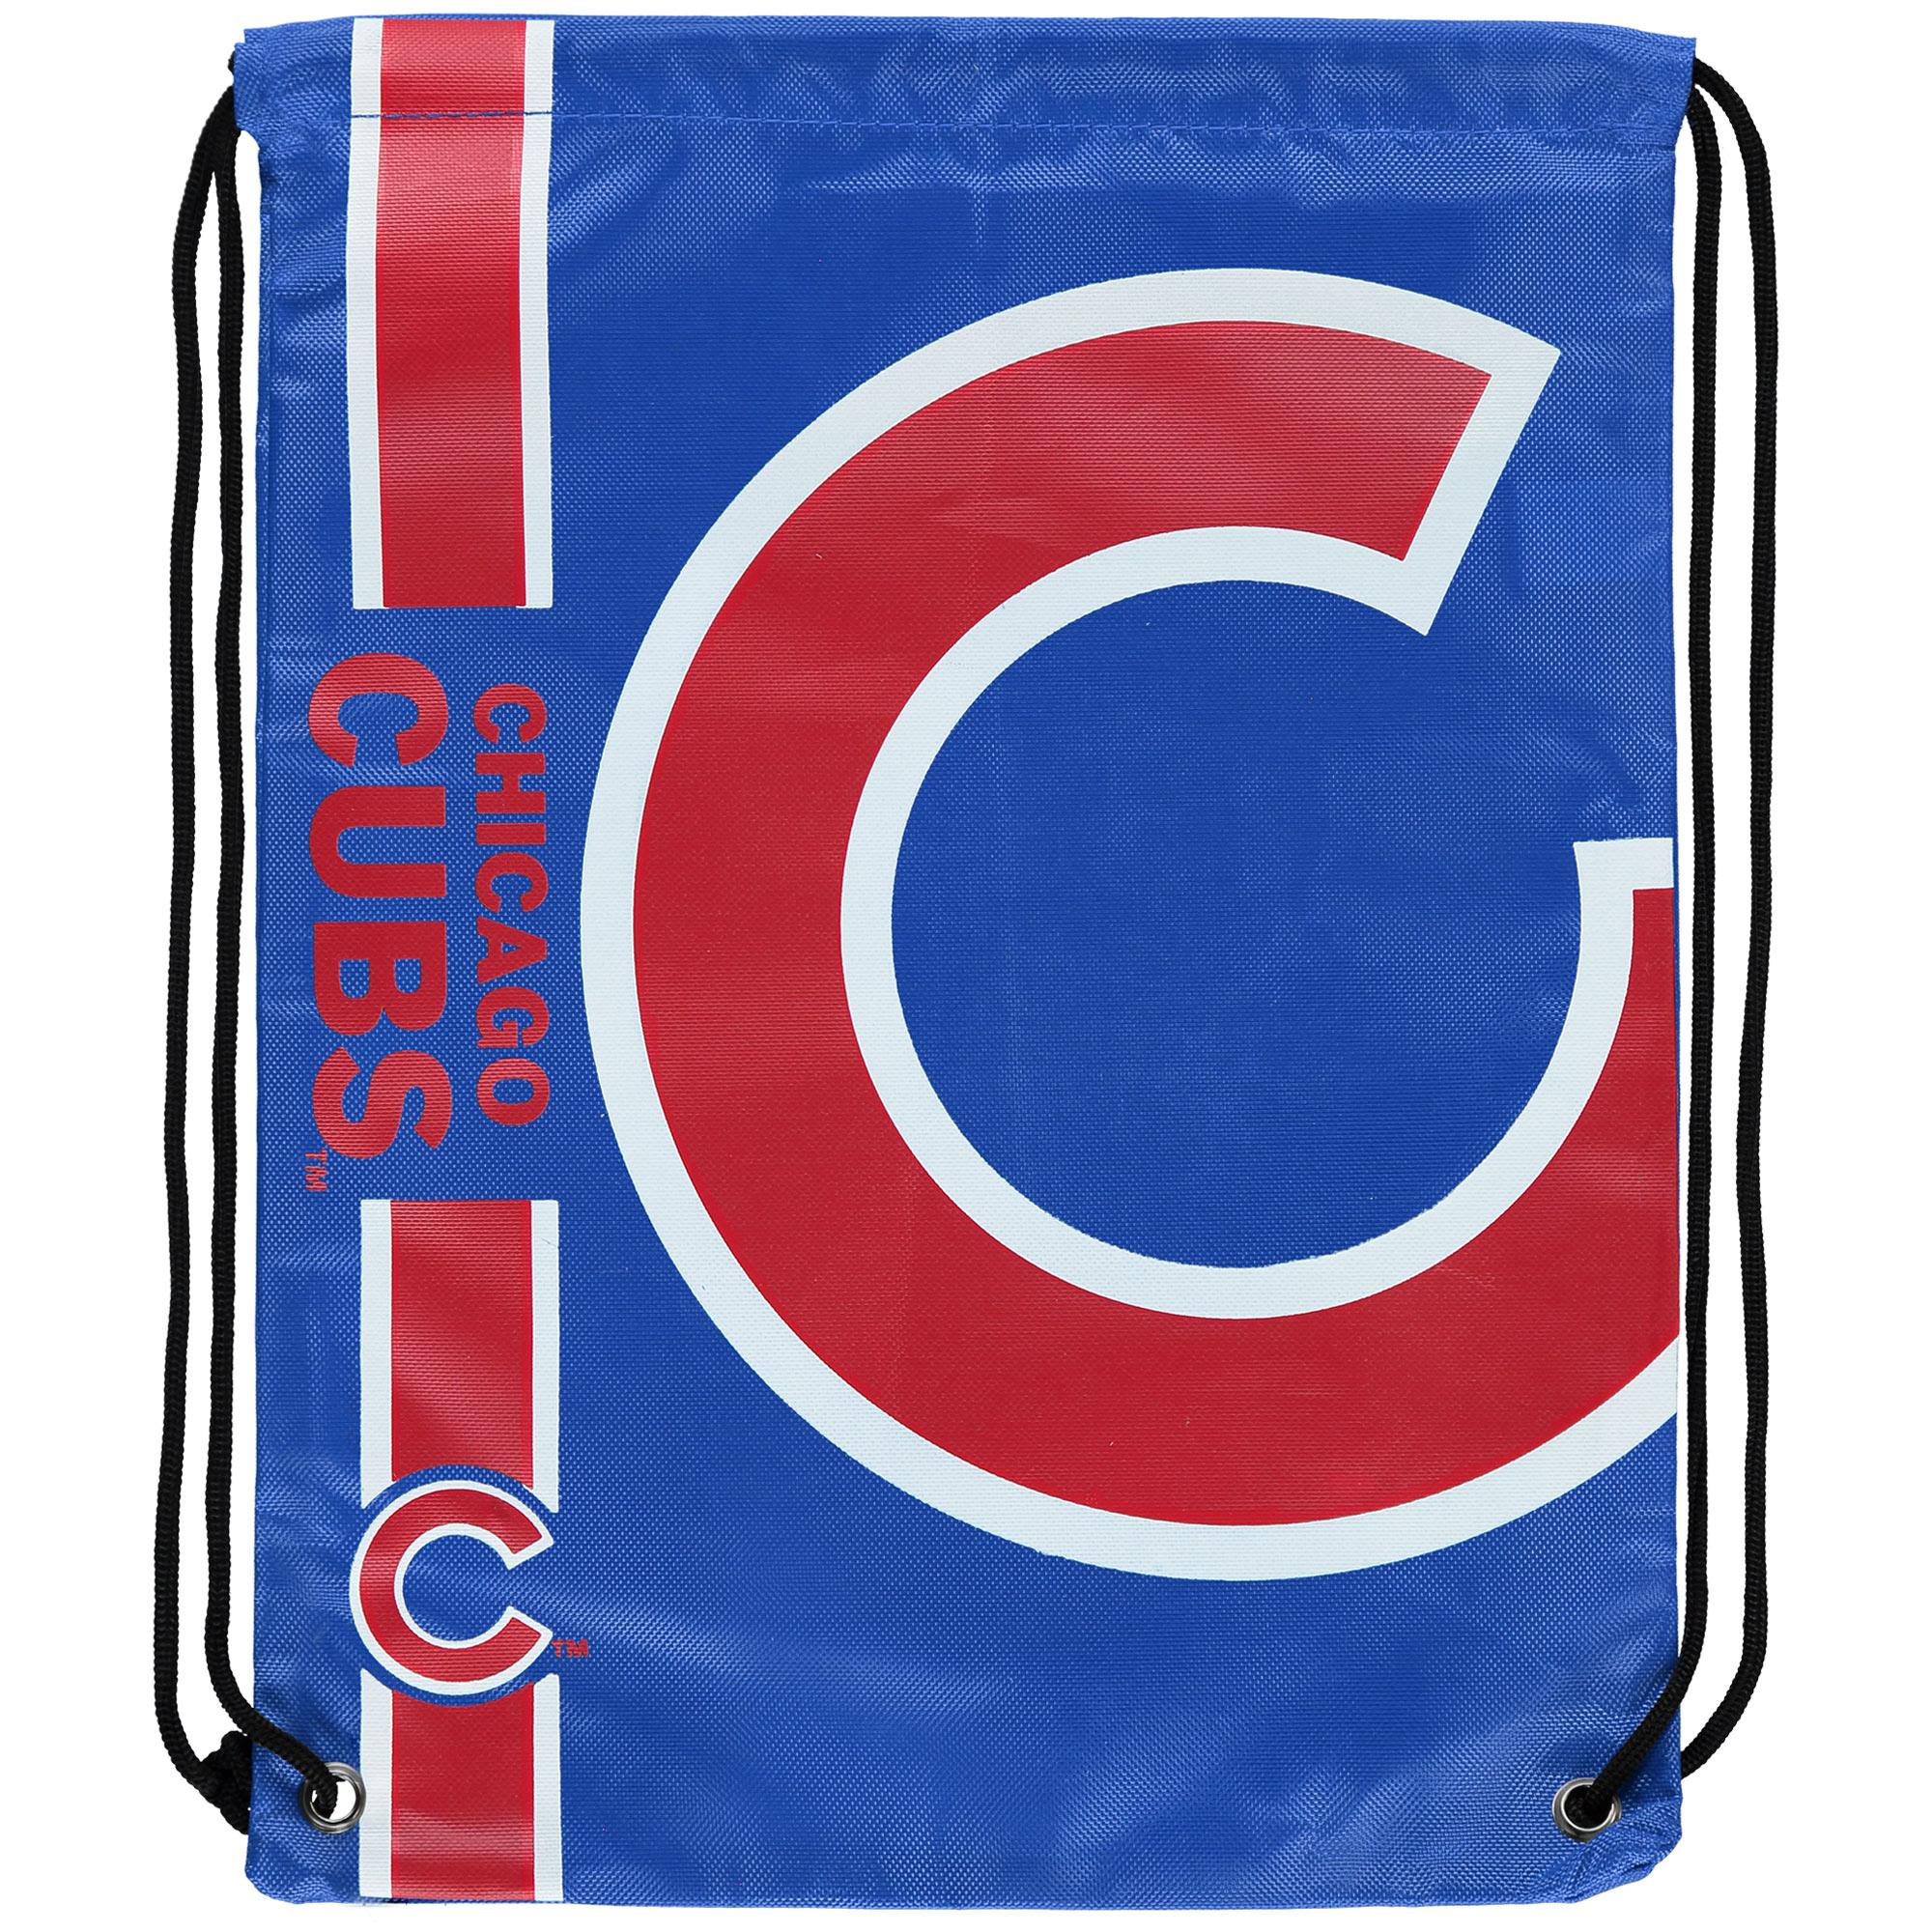 Chicago Cubs Big Logo Drawstring Backpack - No Size